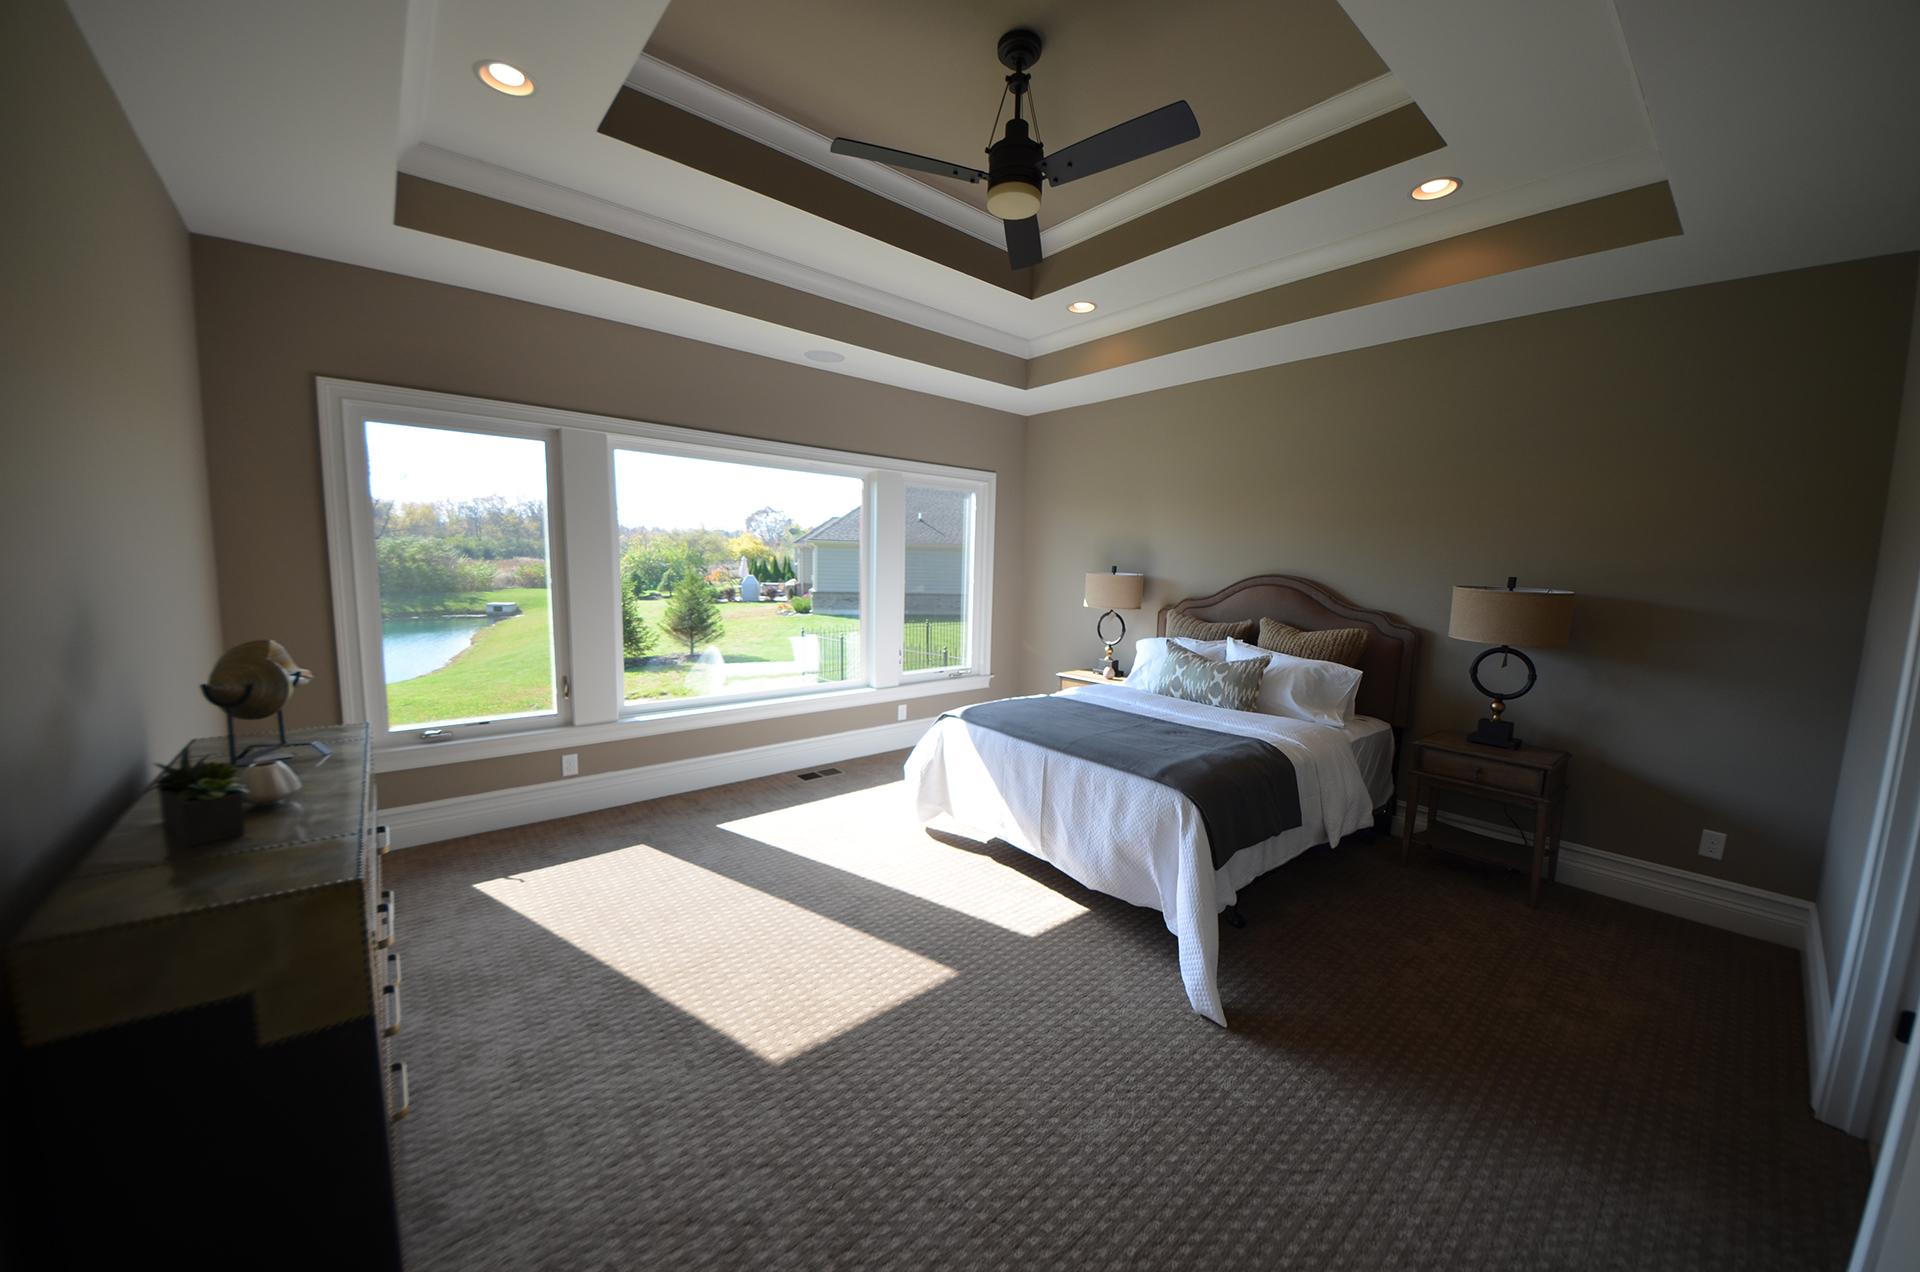 Bedrooms design homes Model home master bedroom decor